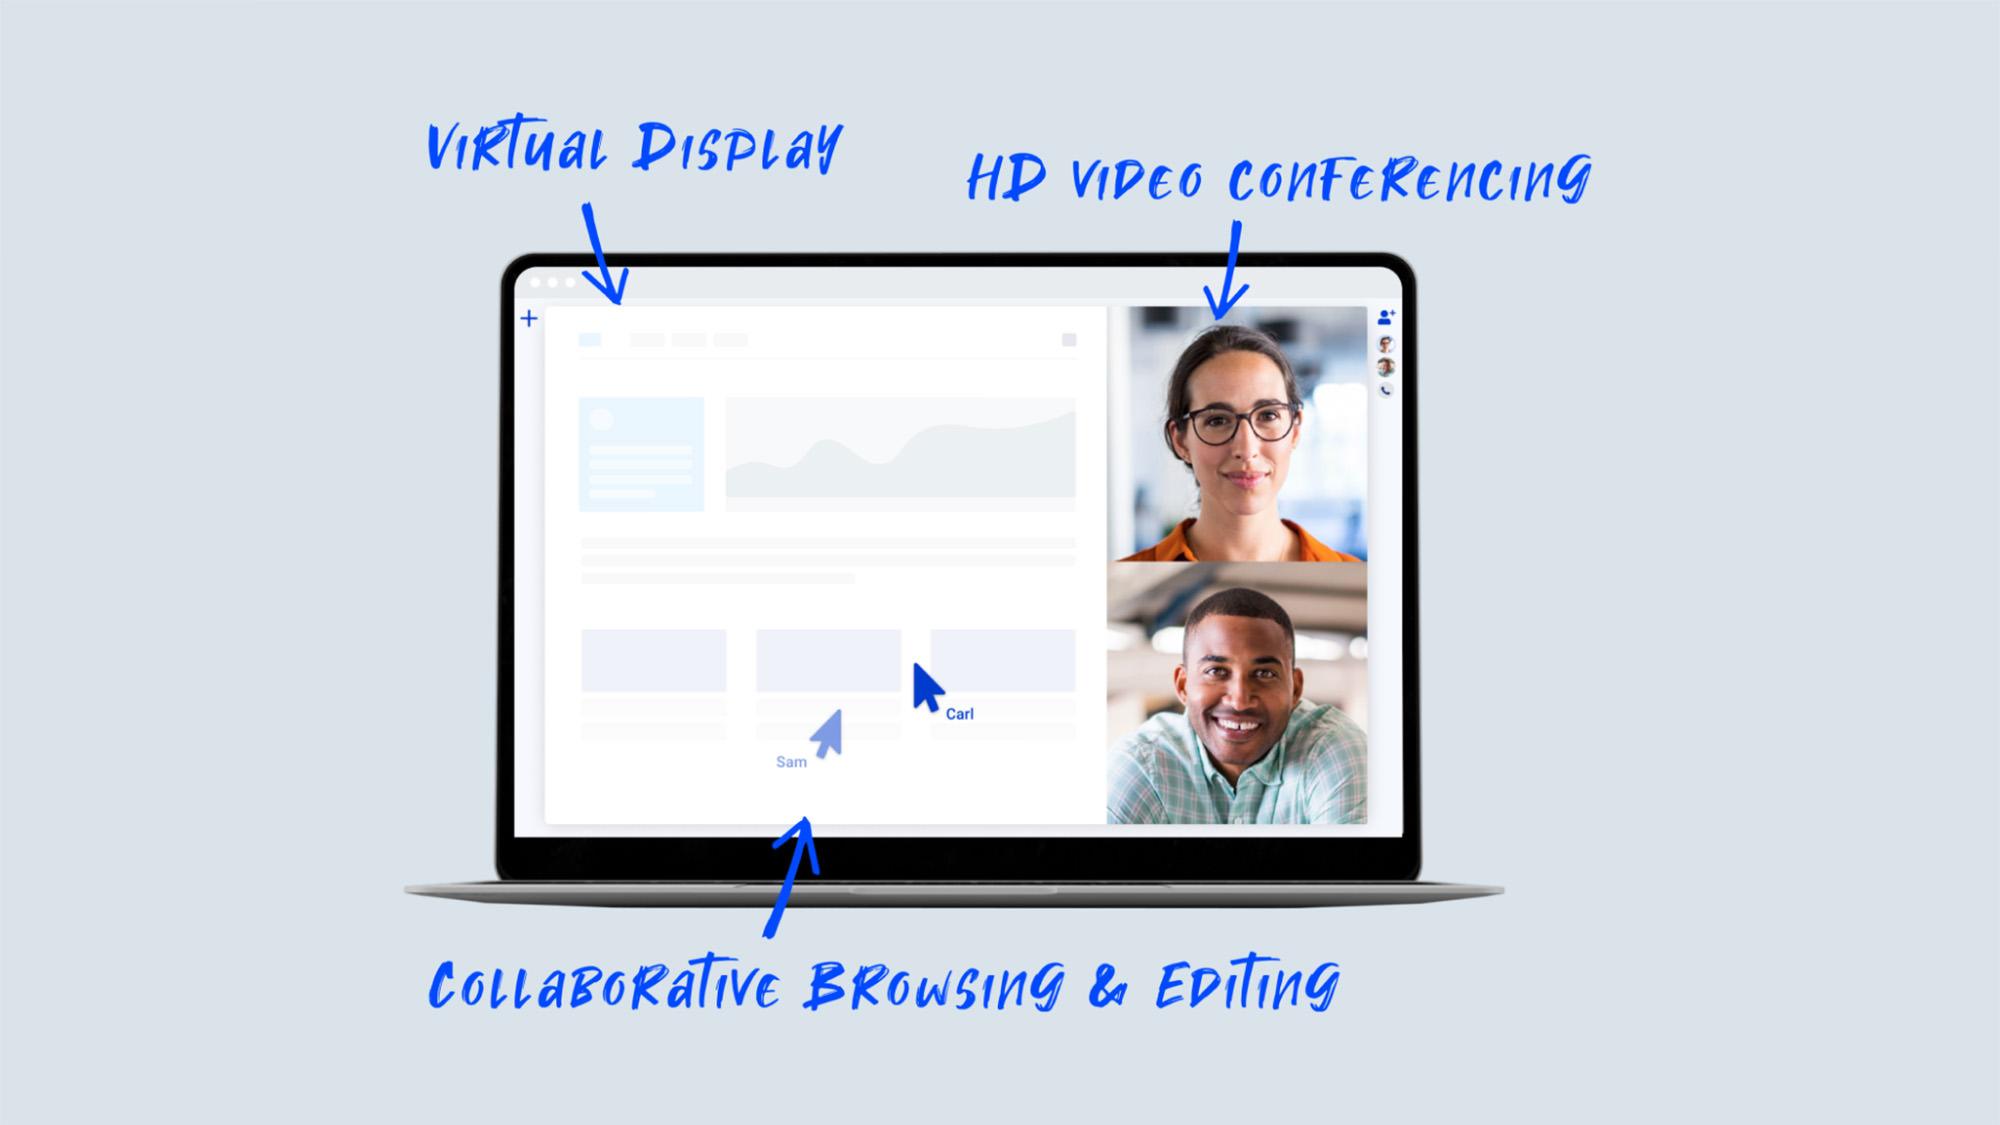 Demodesk-Conversation-Web-Based-Virtual-Display-4